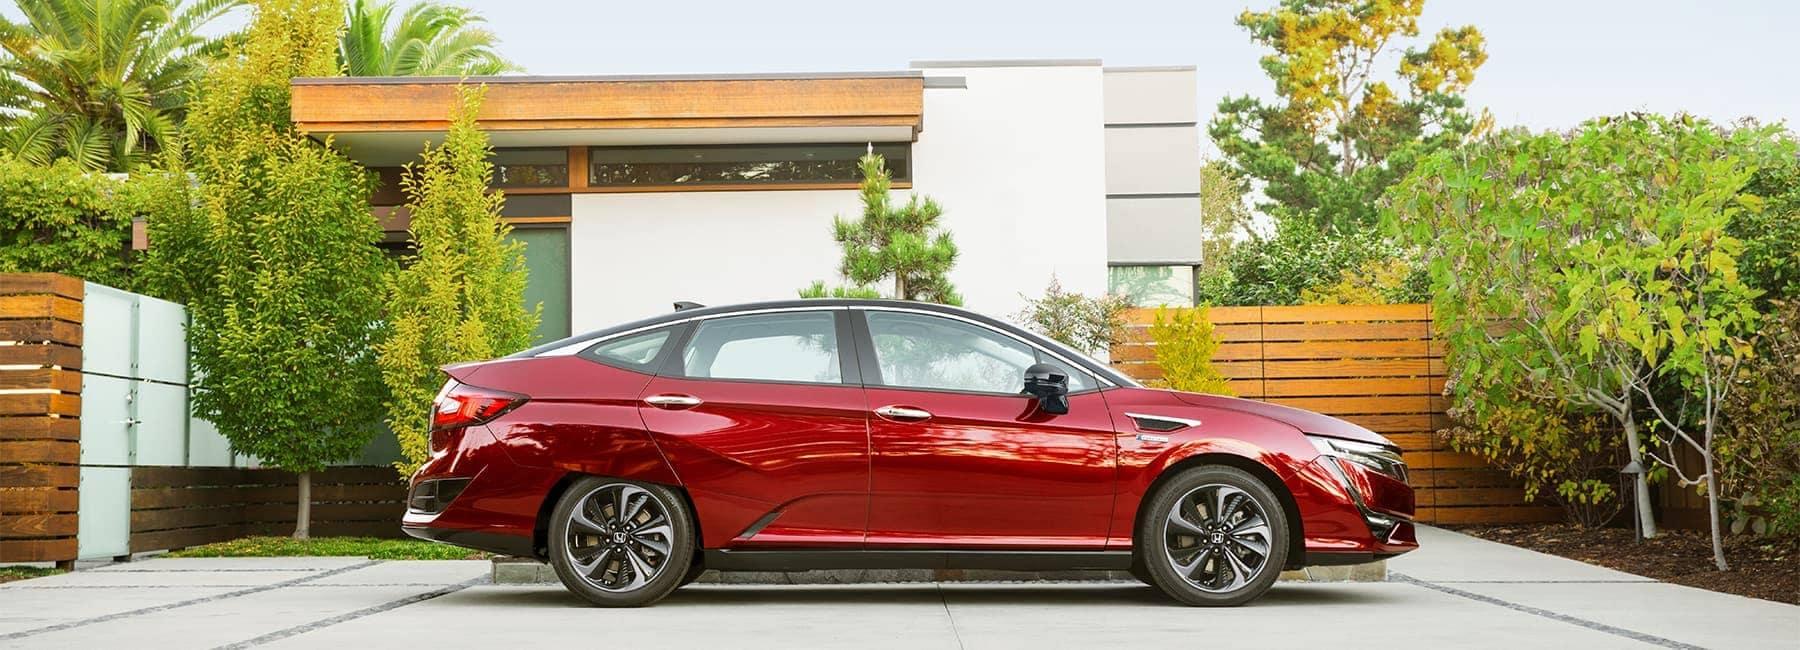 2020 Red Honda Clarity in a driveway